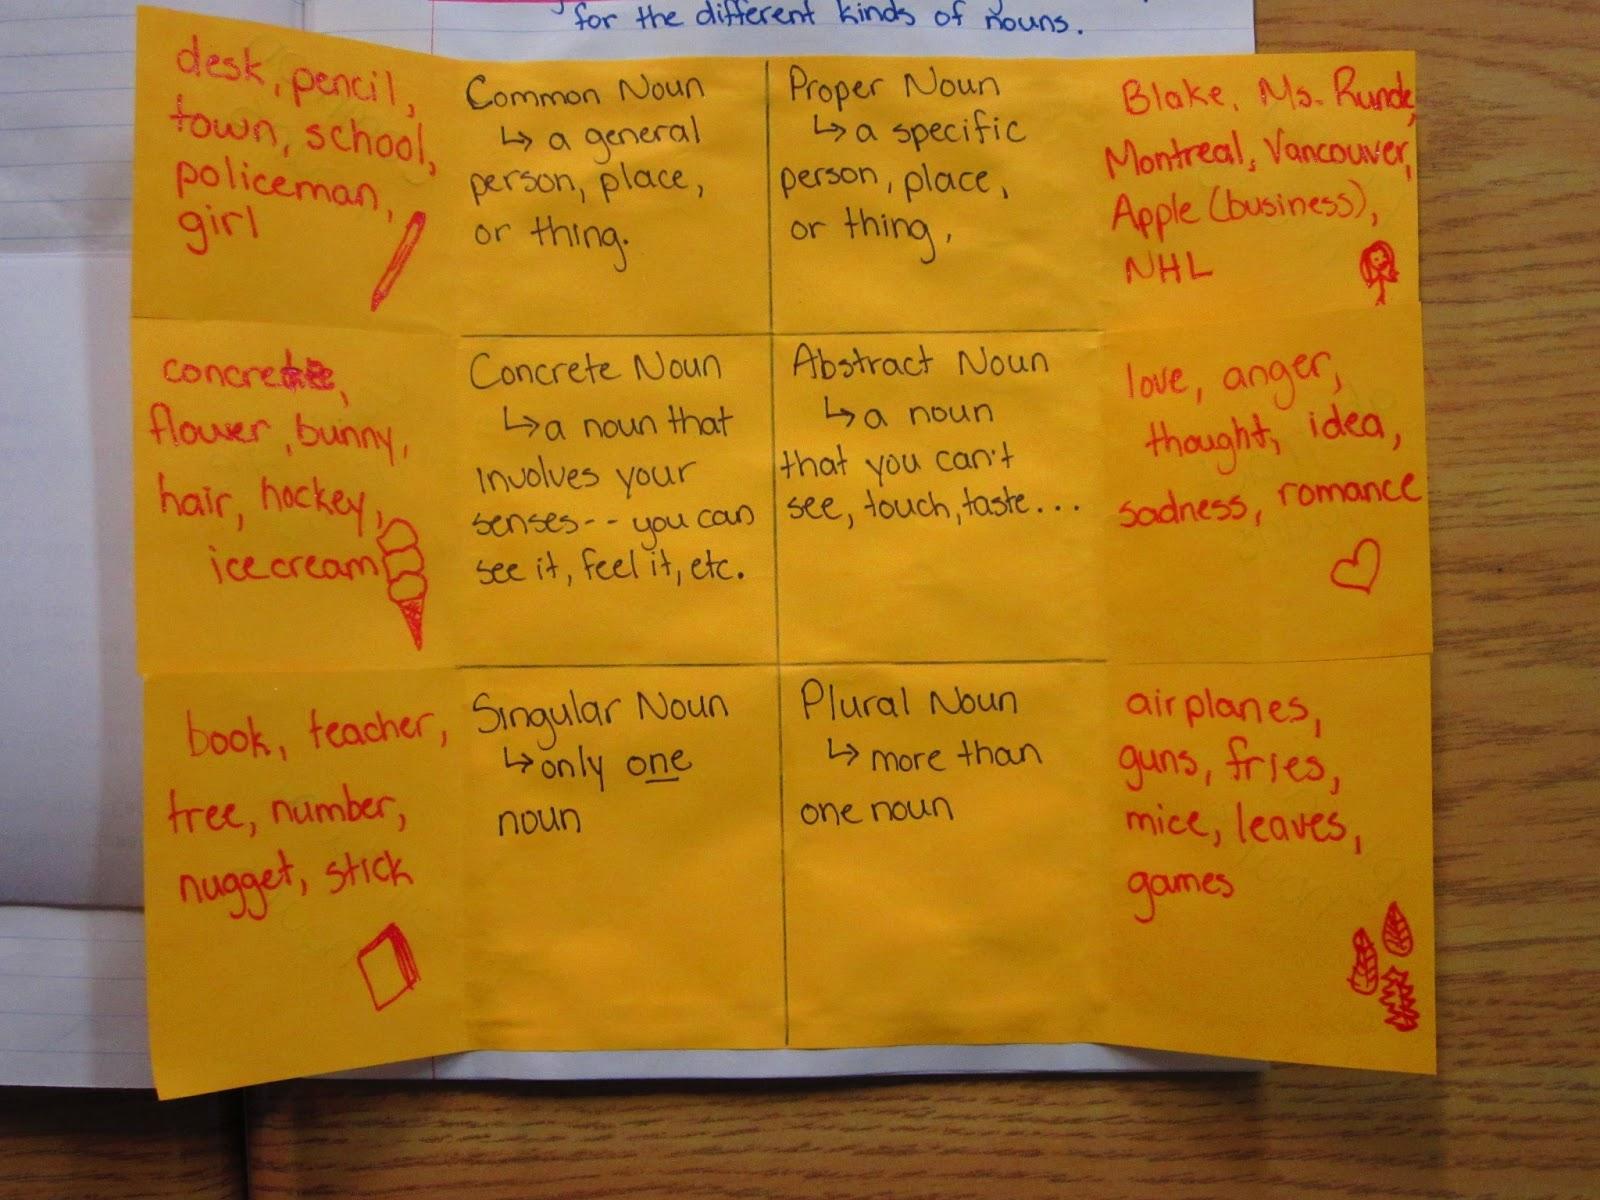 Runde S Room Grammar Talk Tuesdays Nouns And Grammar Bootcamp